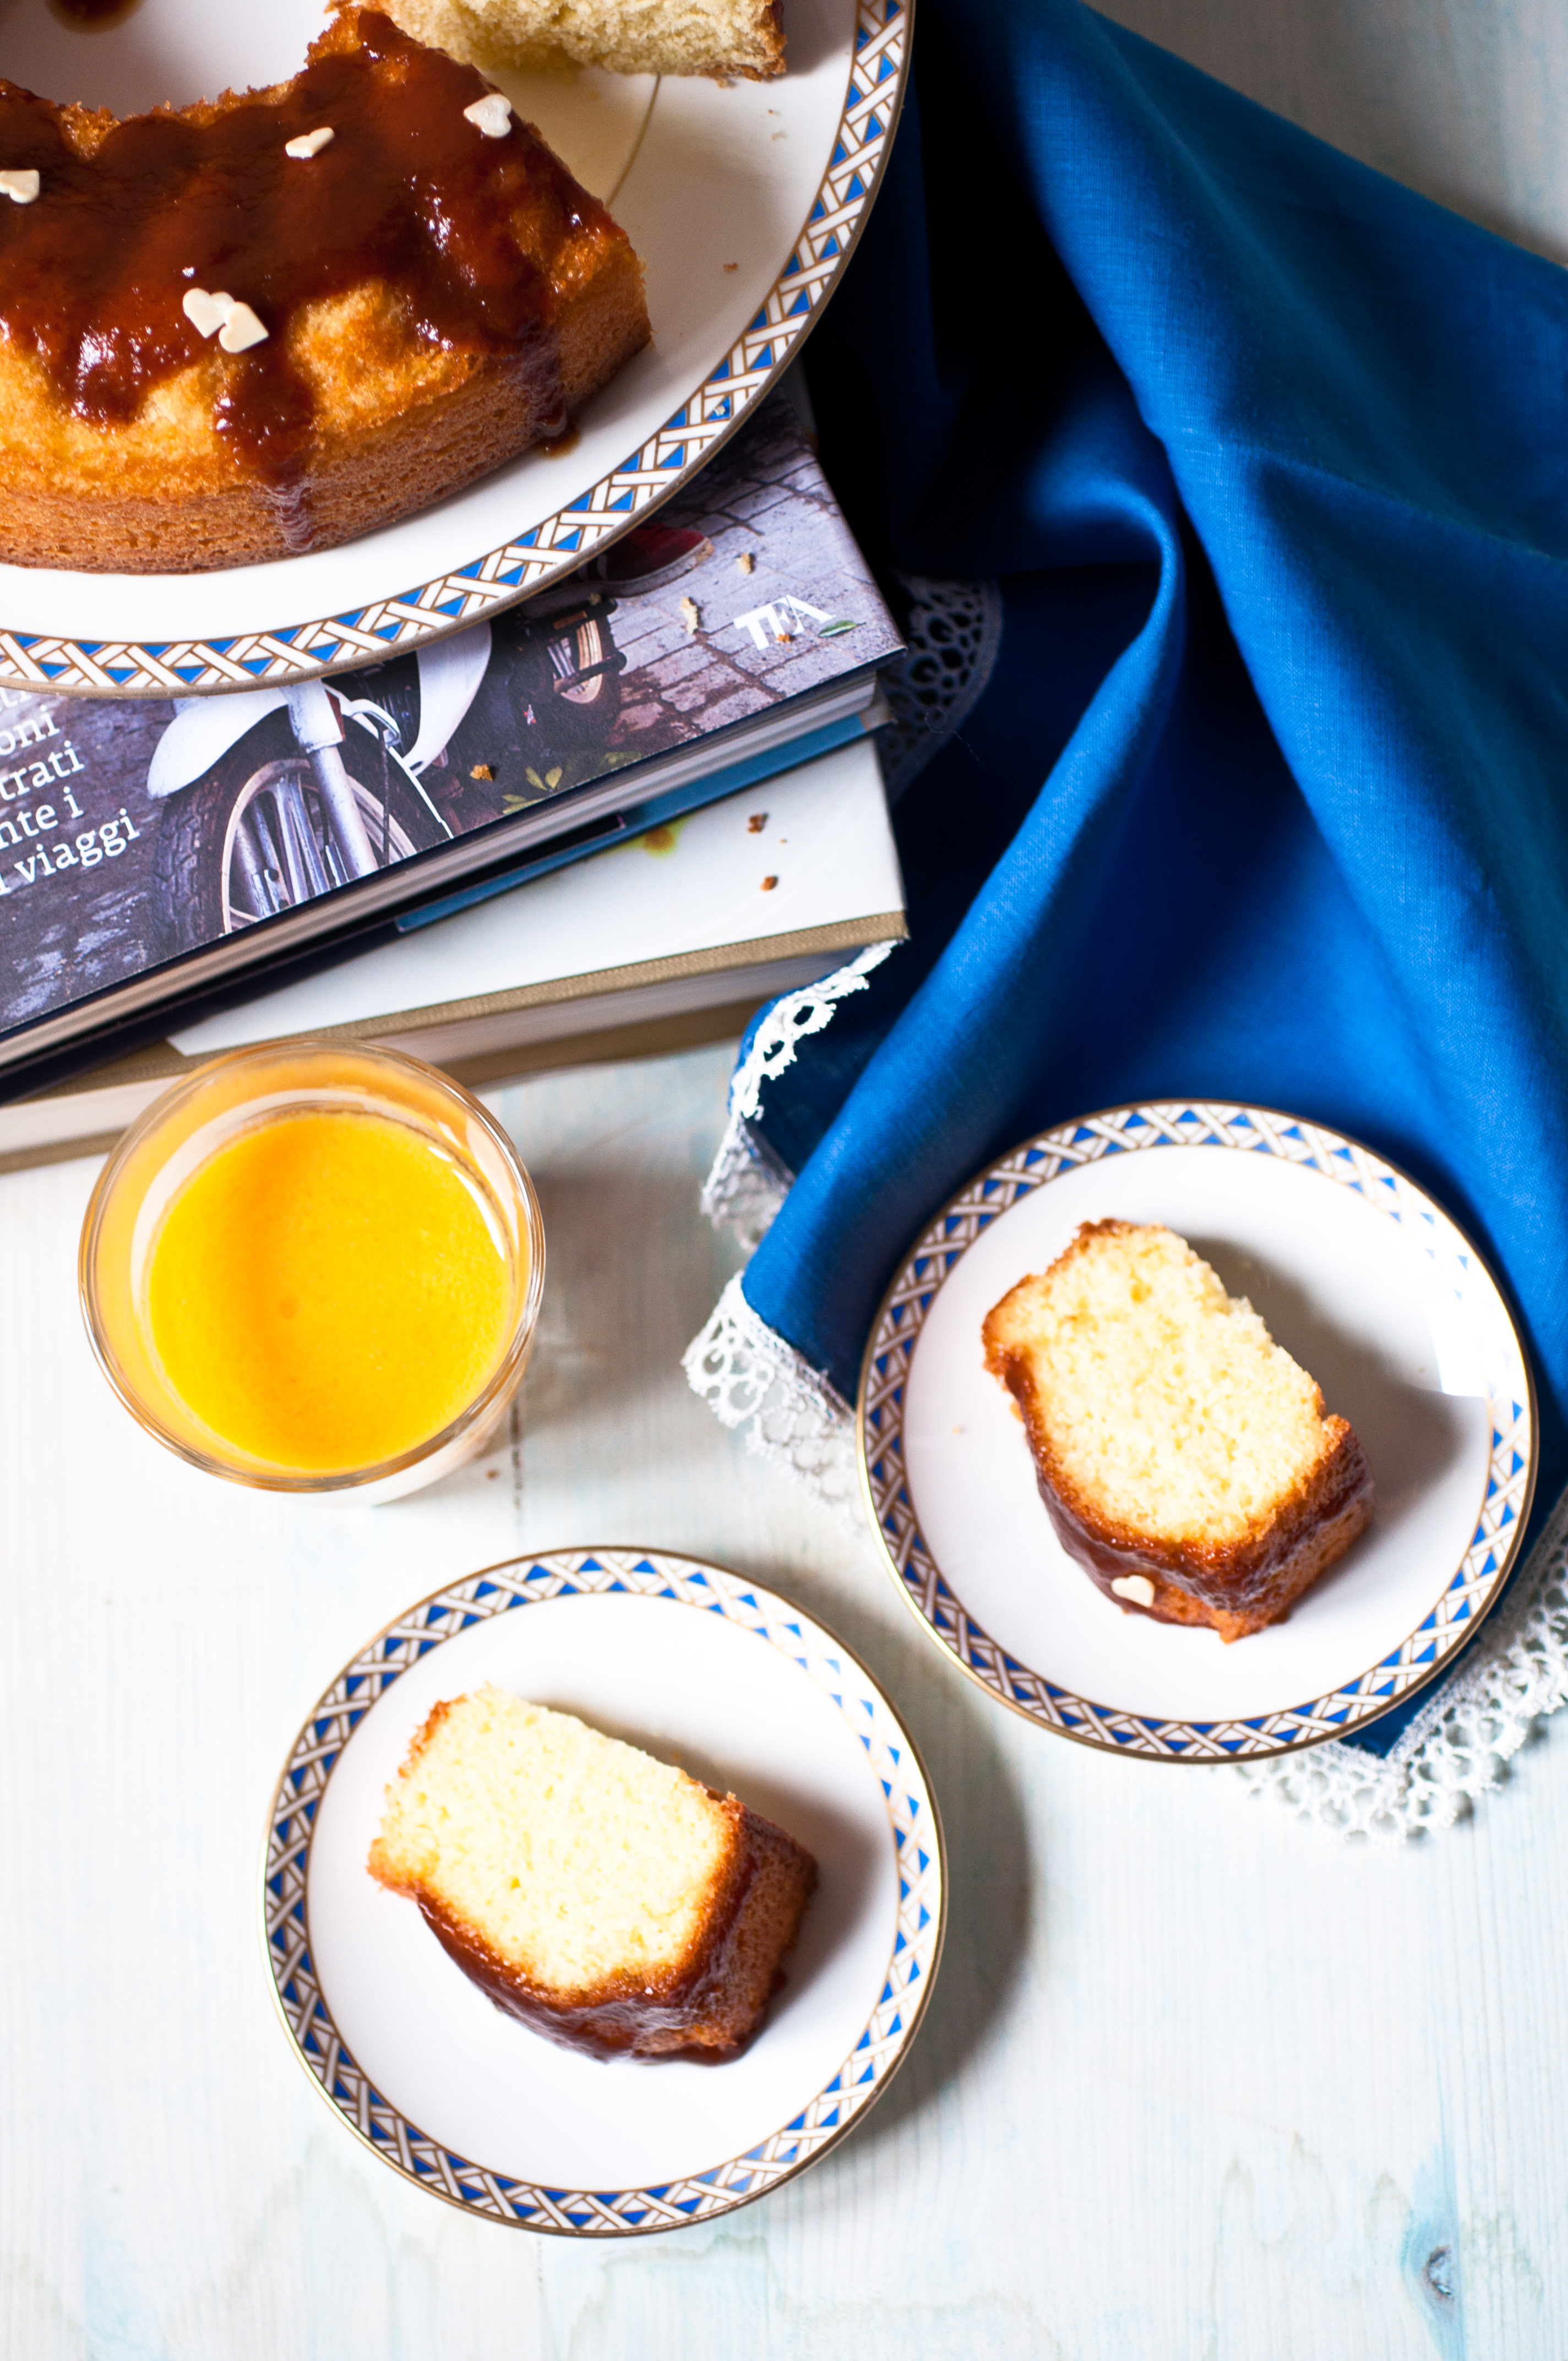 Torta soffice all'olio extravergine e limone